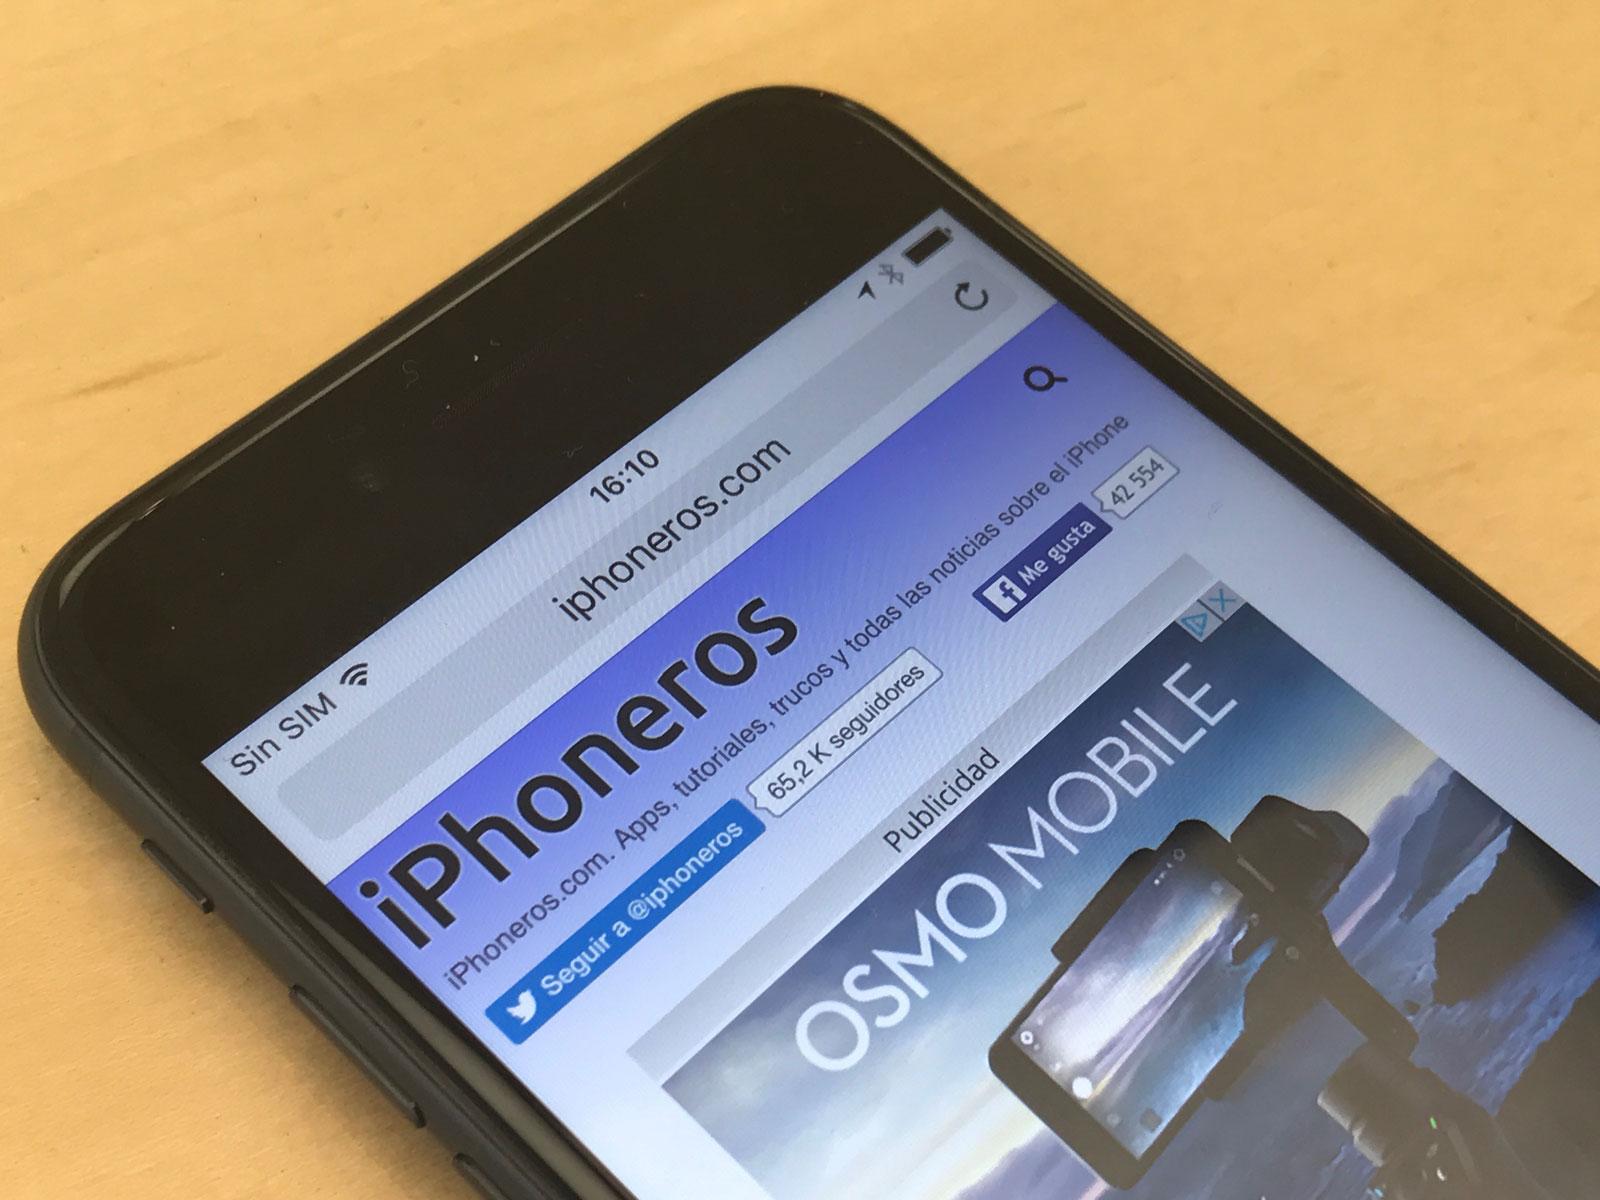 iPhoneros cargada en un iPhone 7